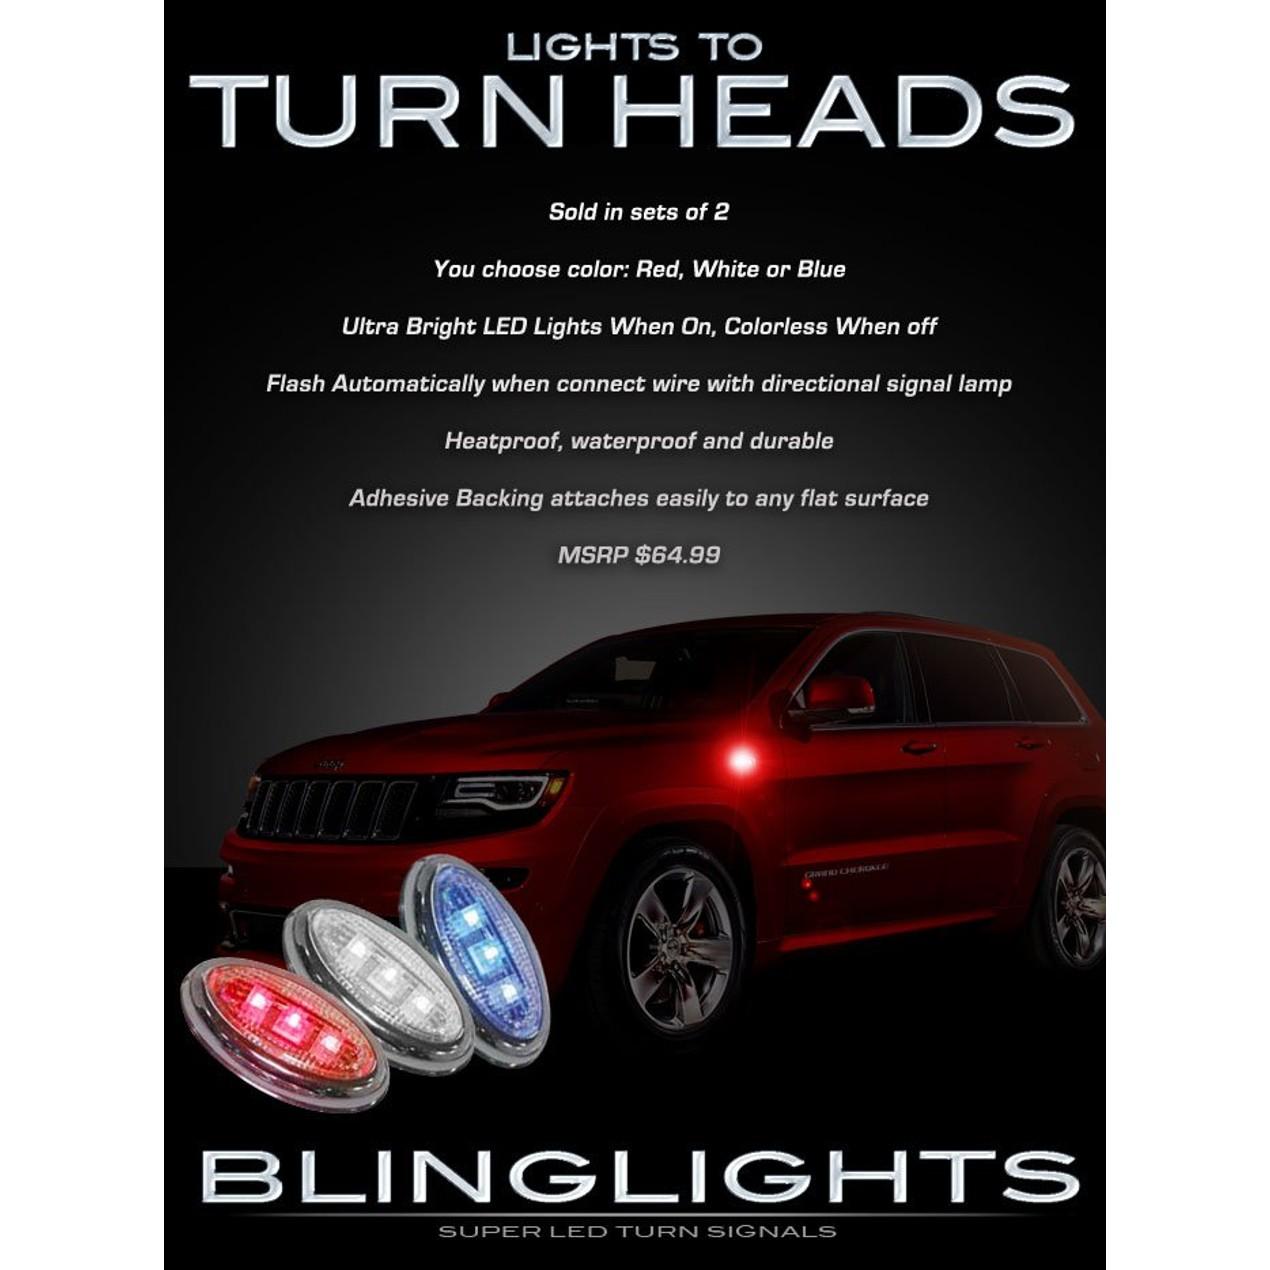 New Jeep Grand Cherokee LED Flush Mount Turn Signal Lights Kit Signaler Bli  ...